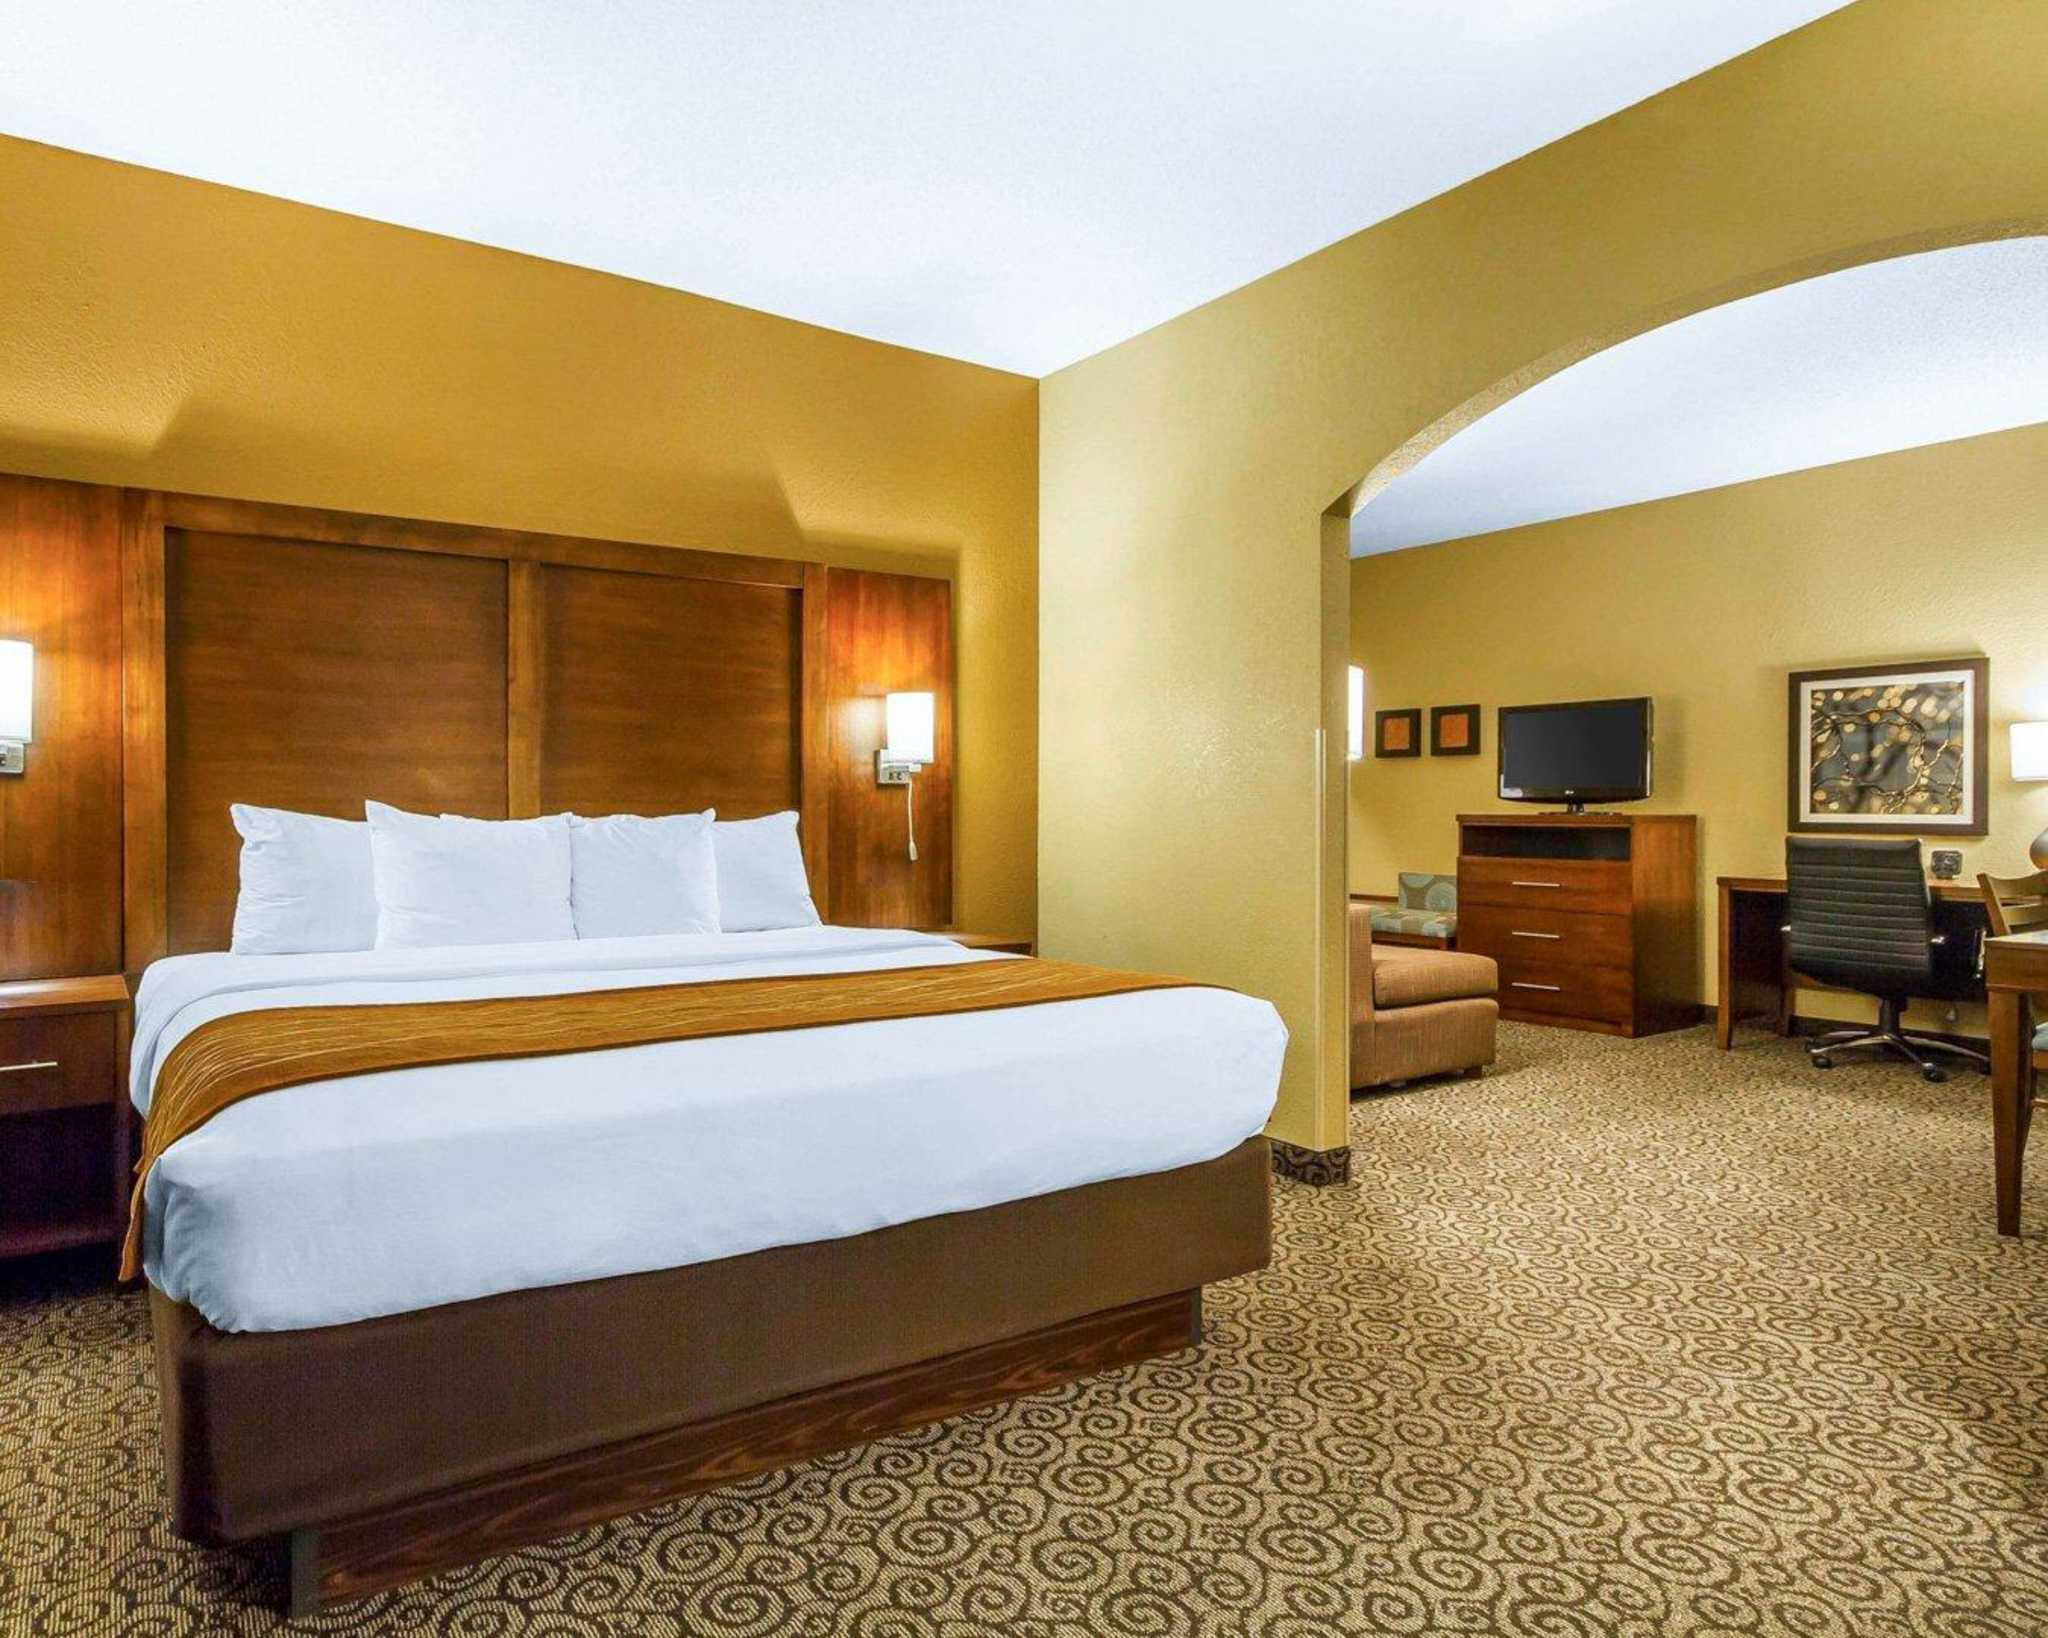 Comfort Suites image 1